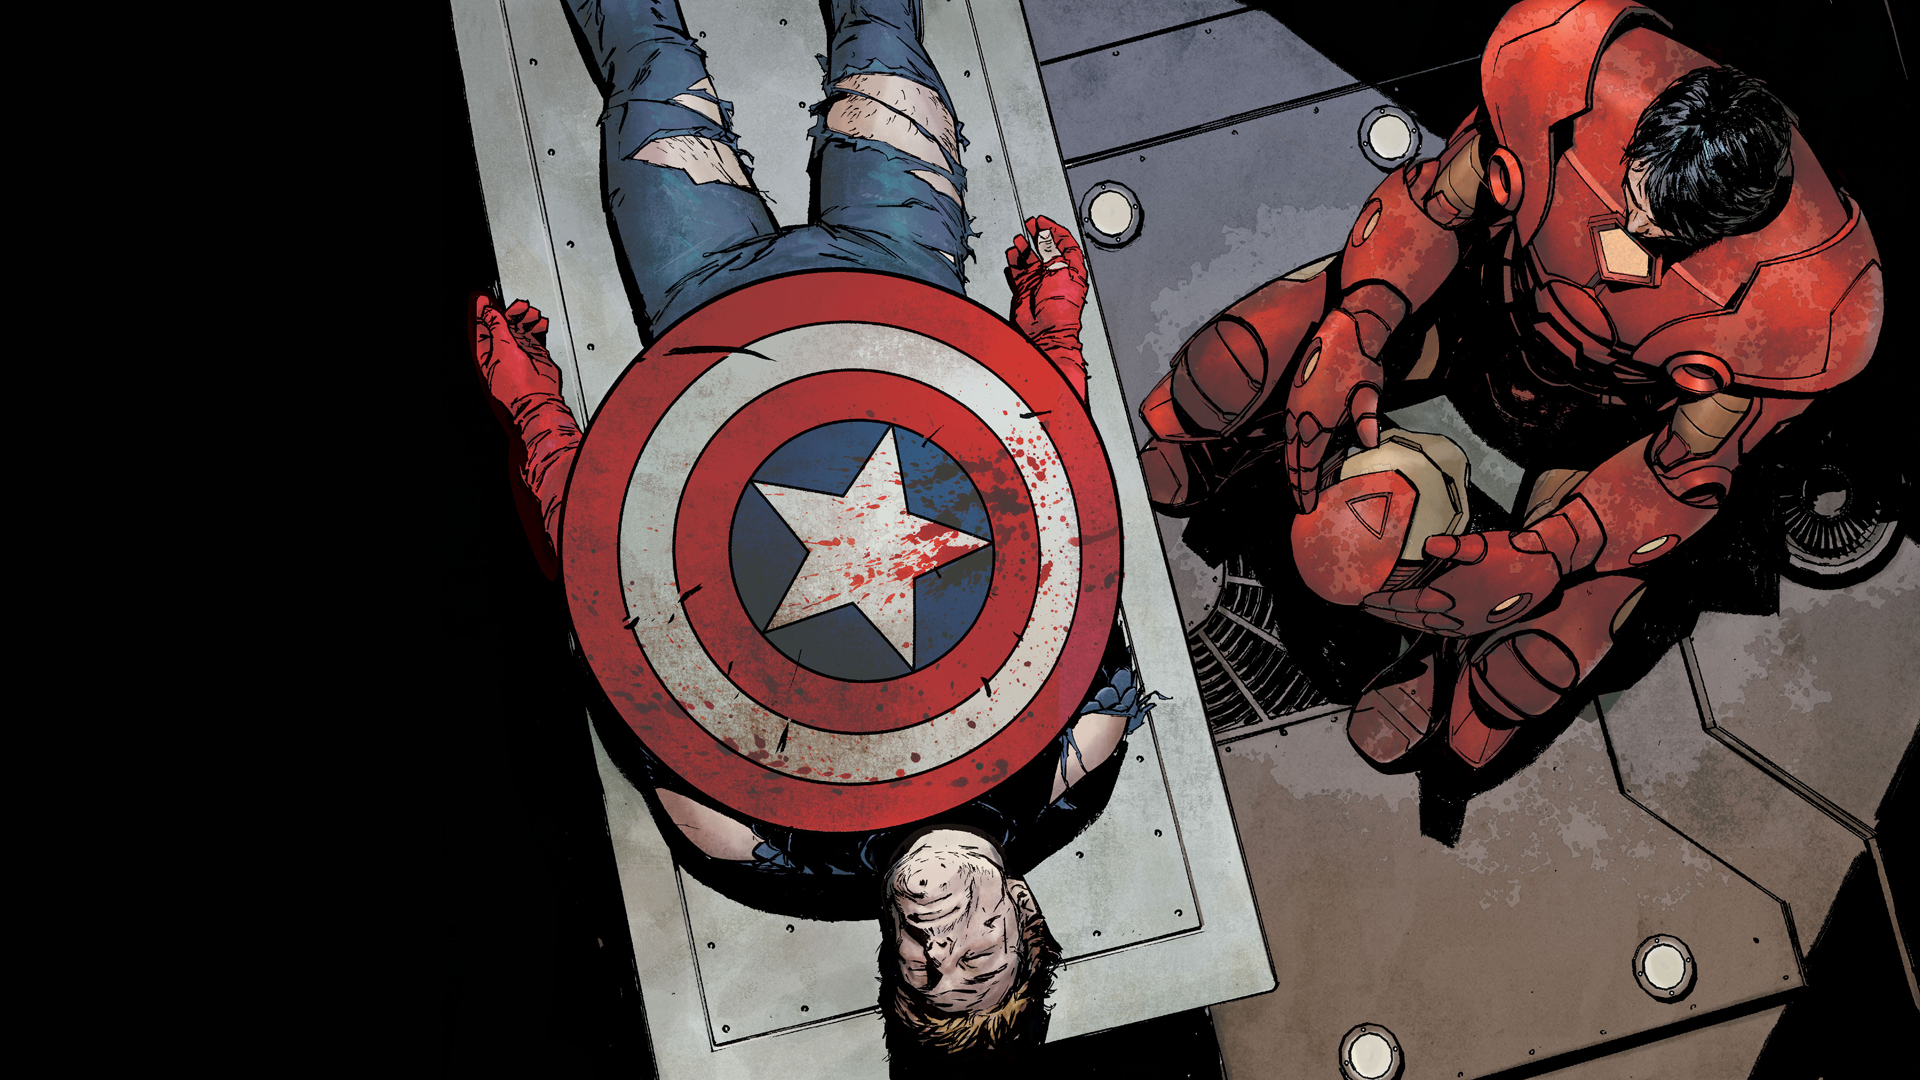 Avengers Hd Wallpaper Background Image 1920x1080 Id 372961